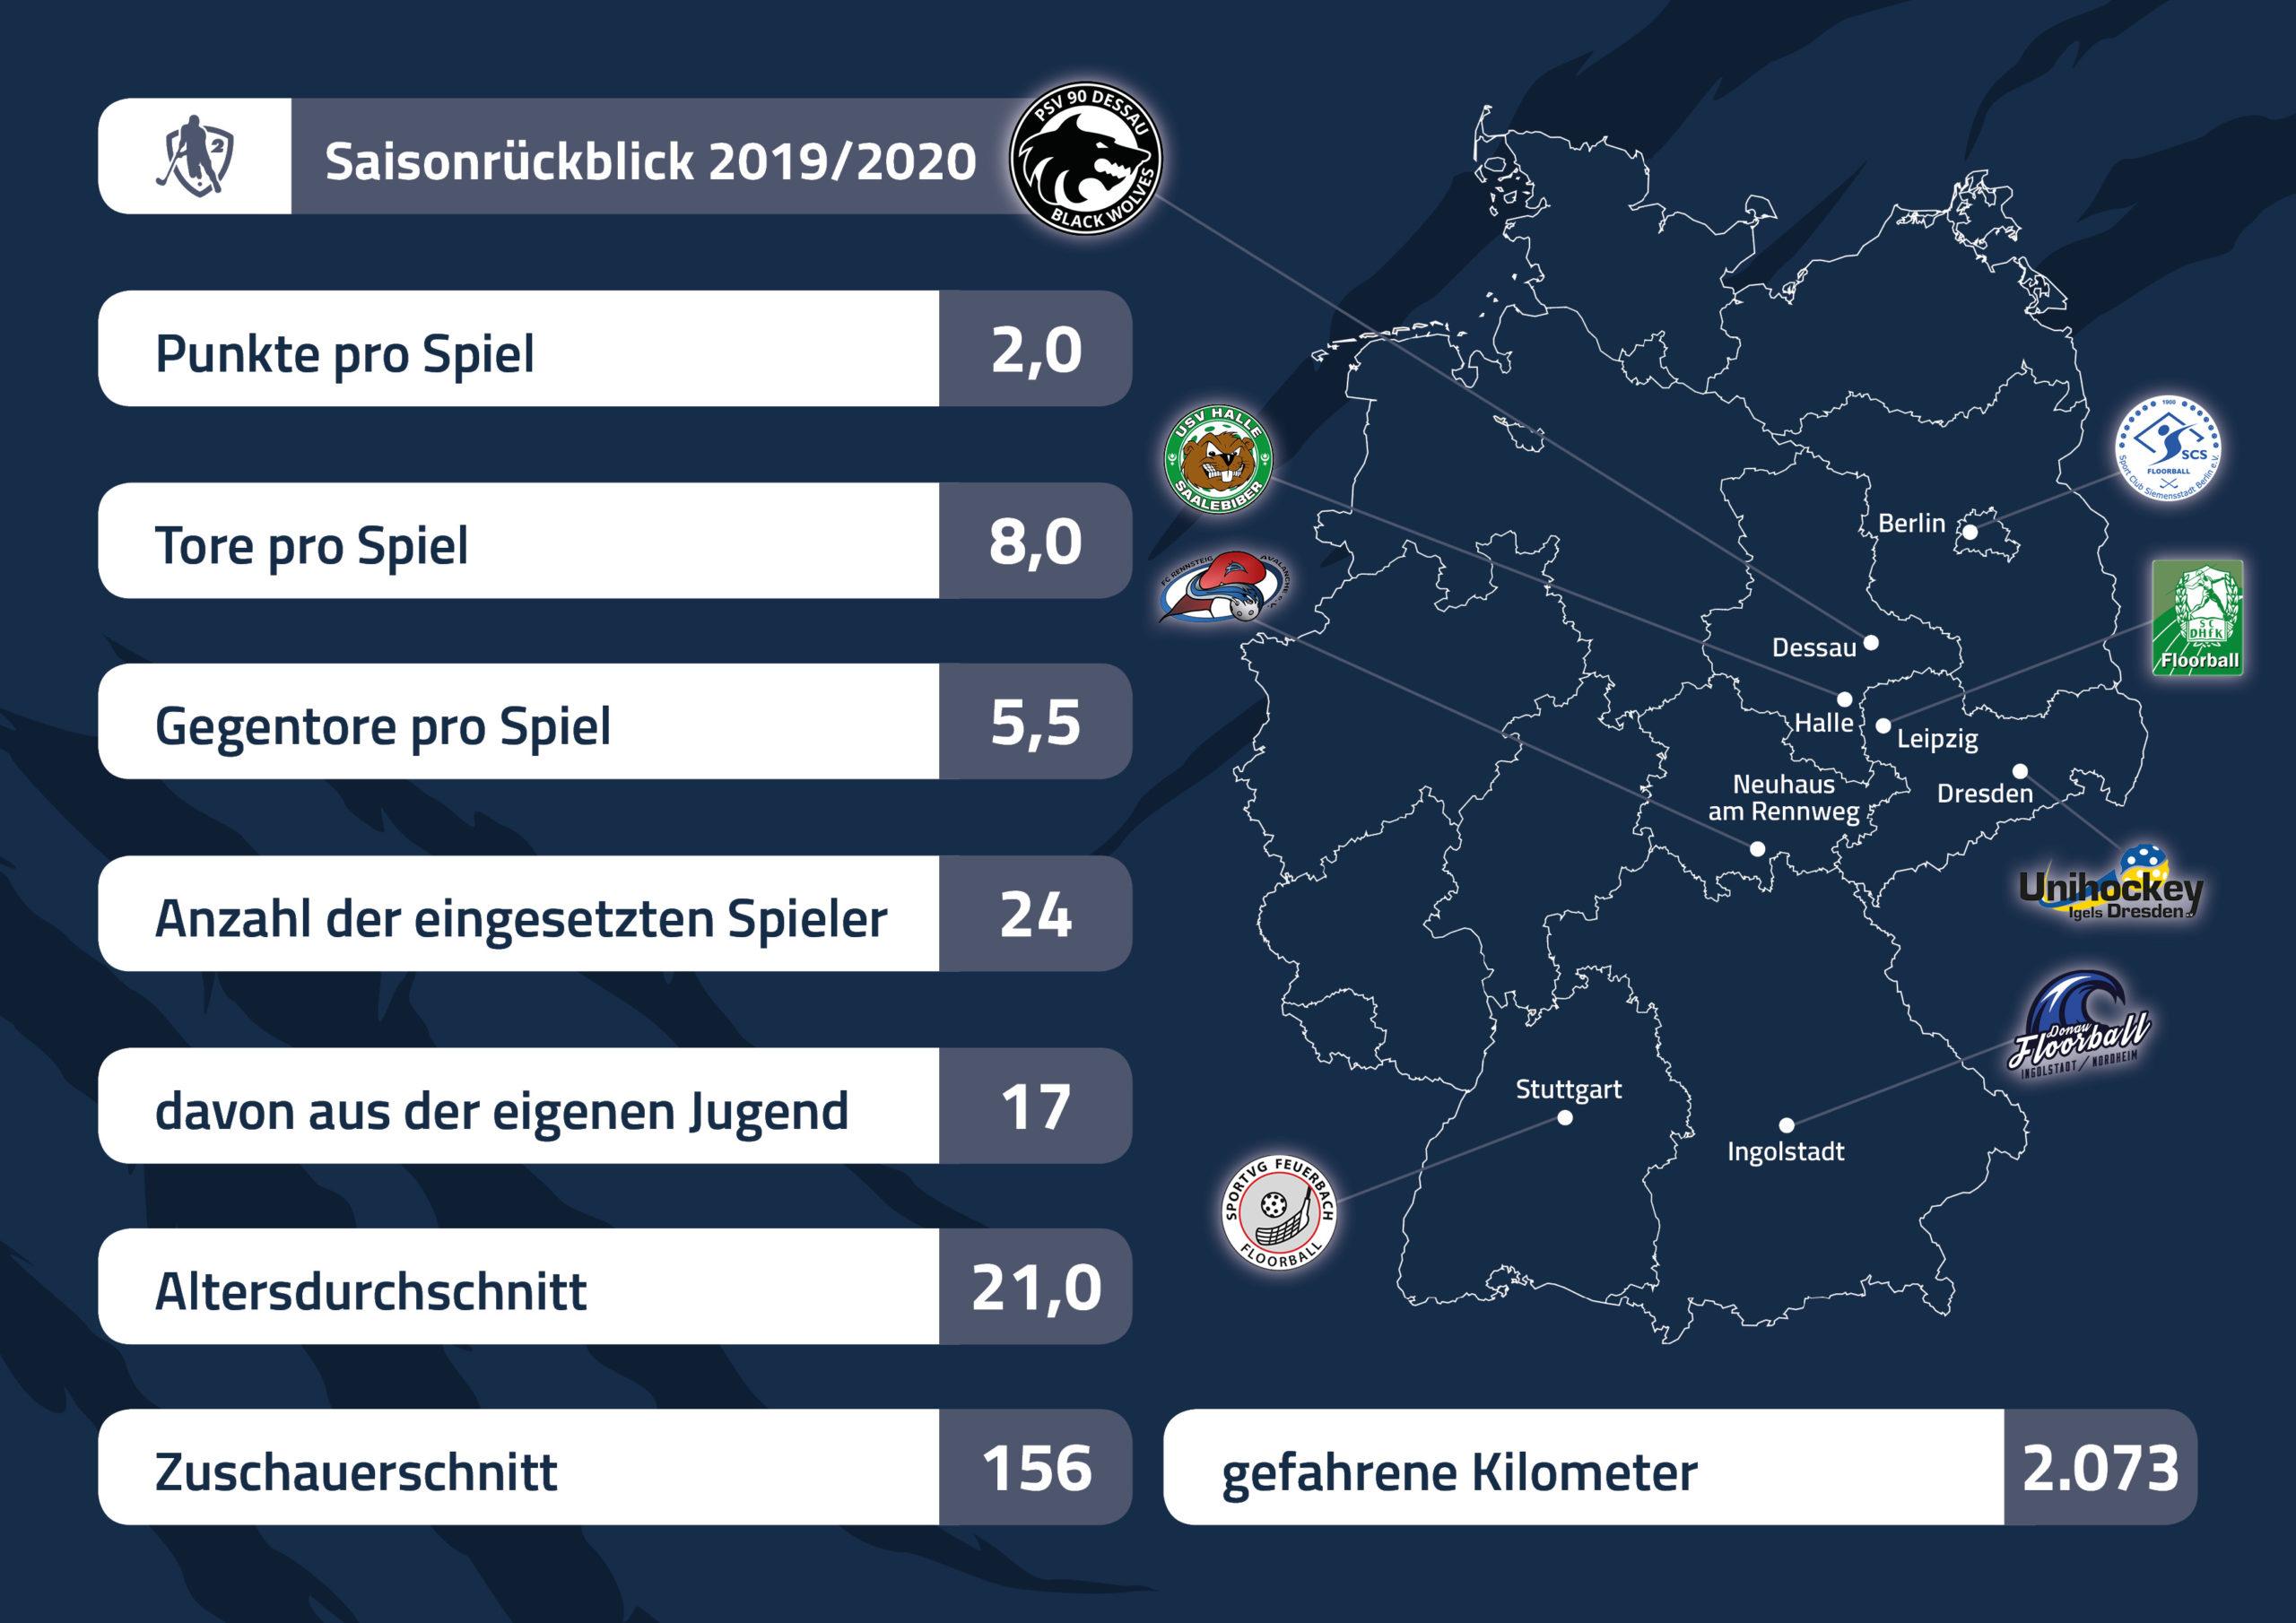 Bundesliga-Rückblick 2019/2020